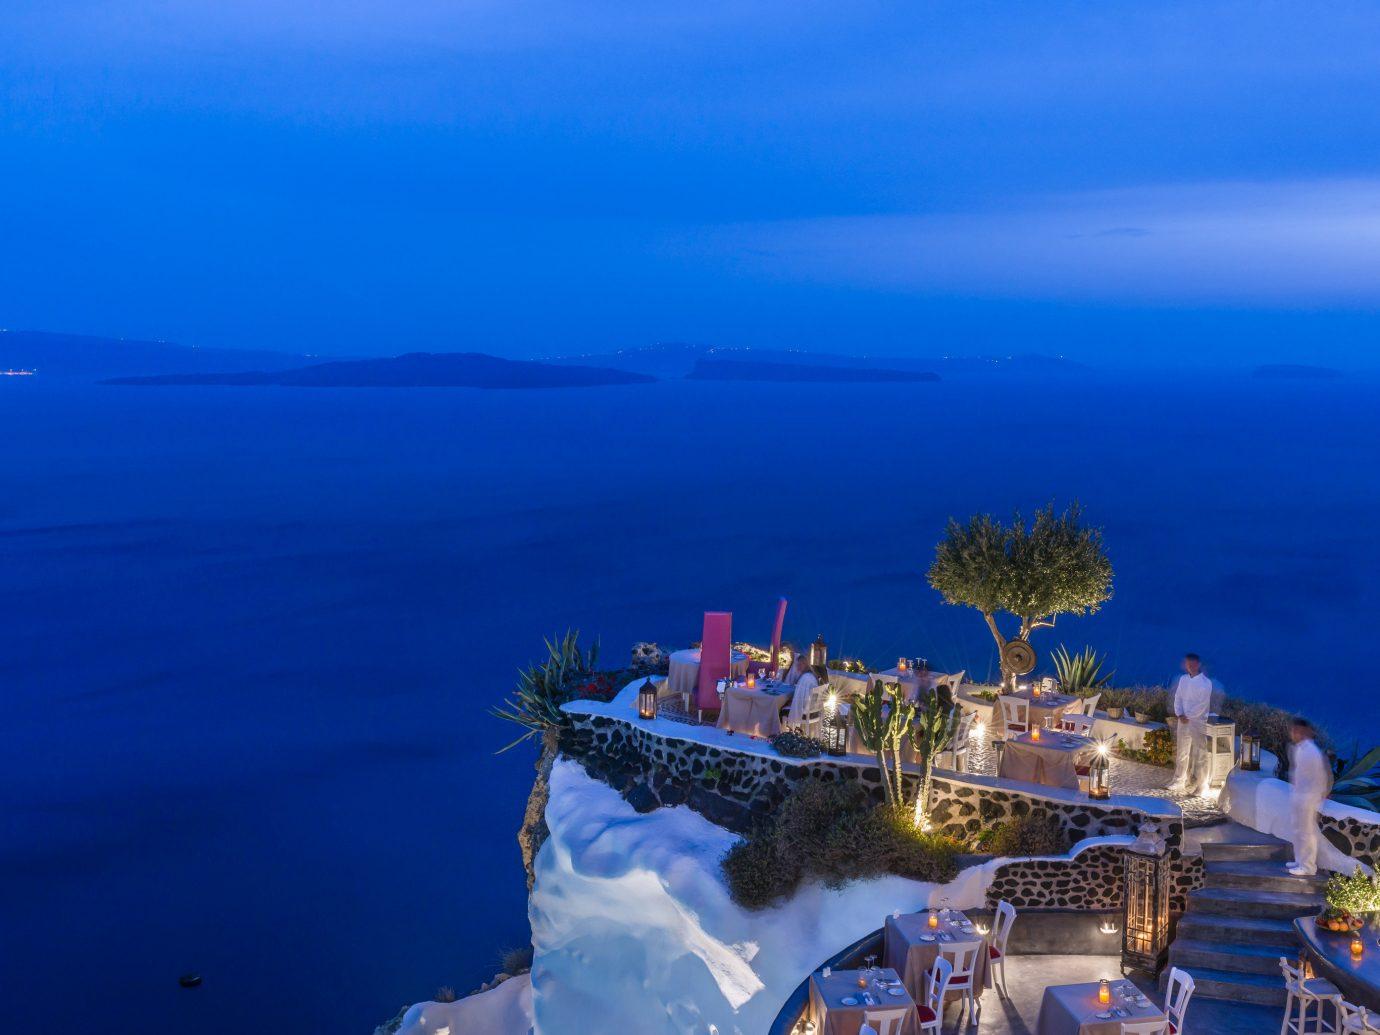 Lycabettus Restaurant overlooking the ocean in Oia, Greece